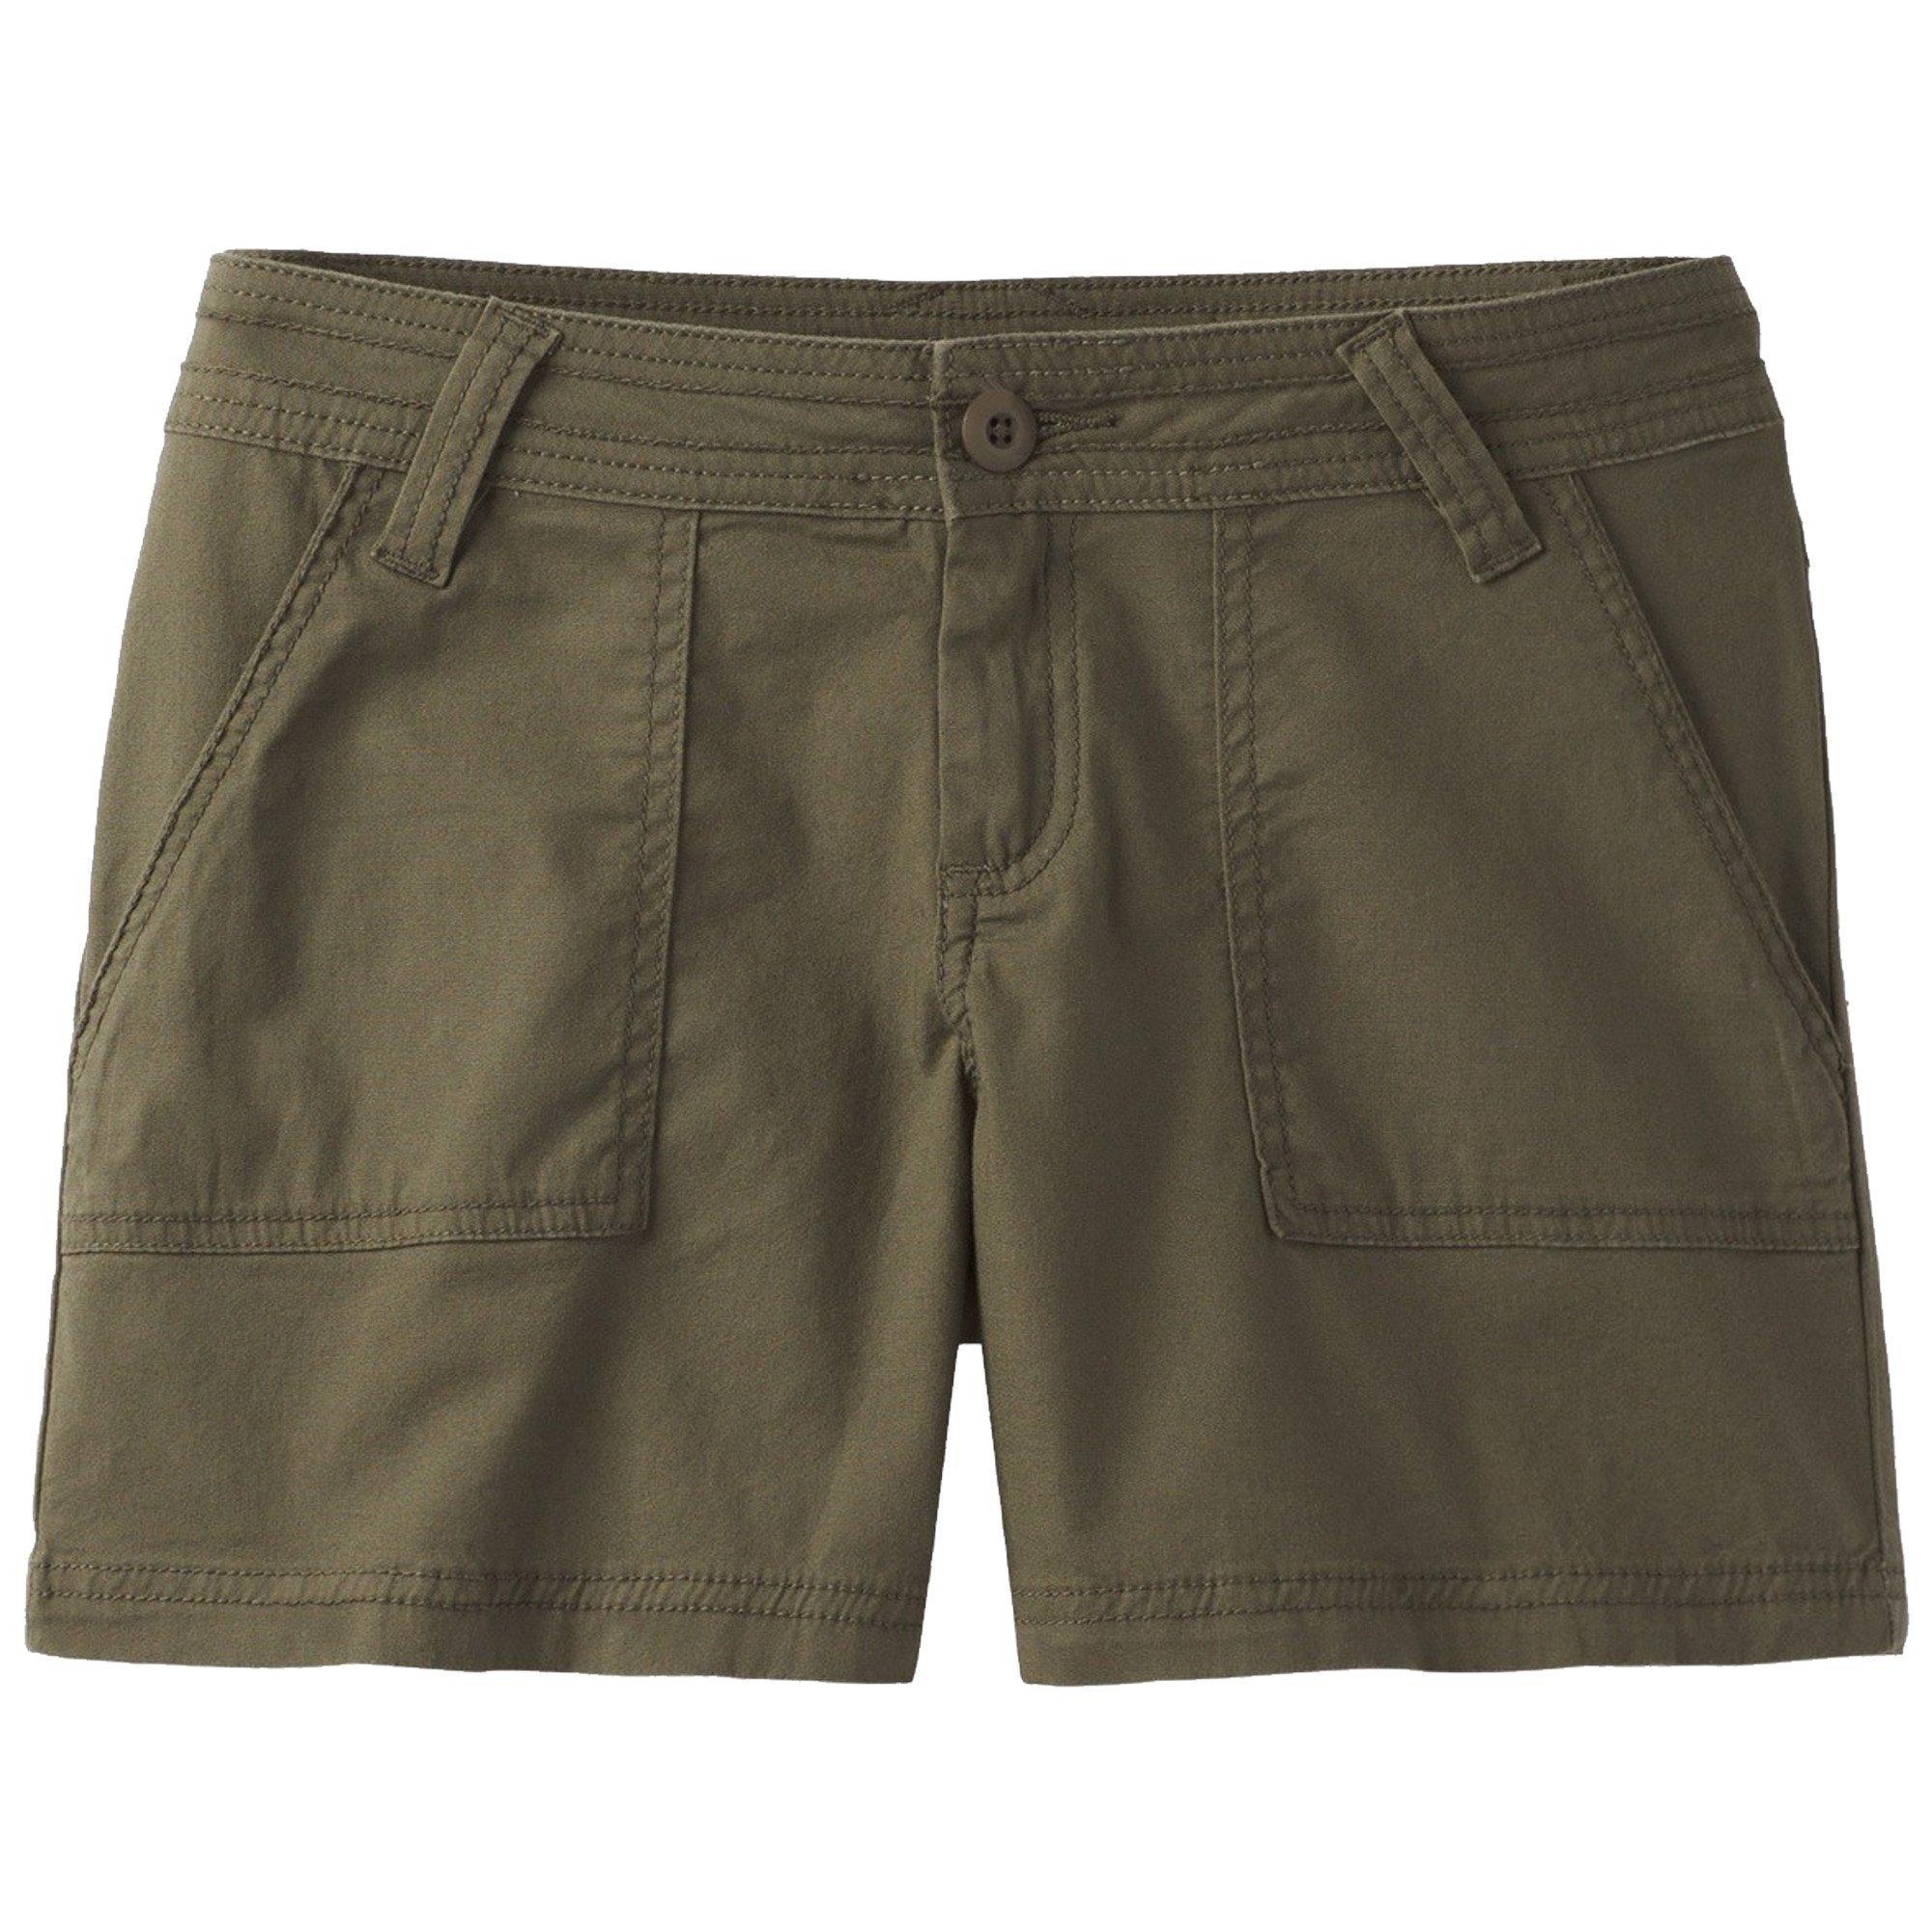 prAna Tess 5'' Inseam Shorts, Cargo Green, Size 10